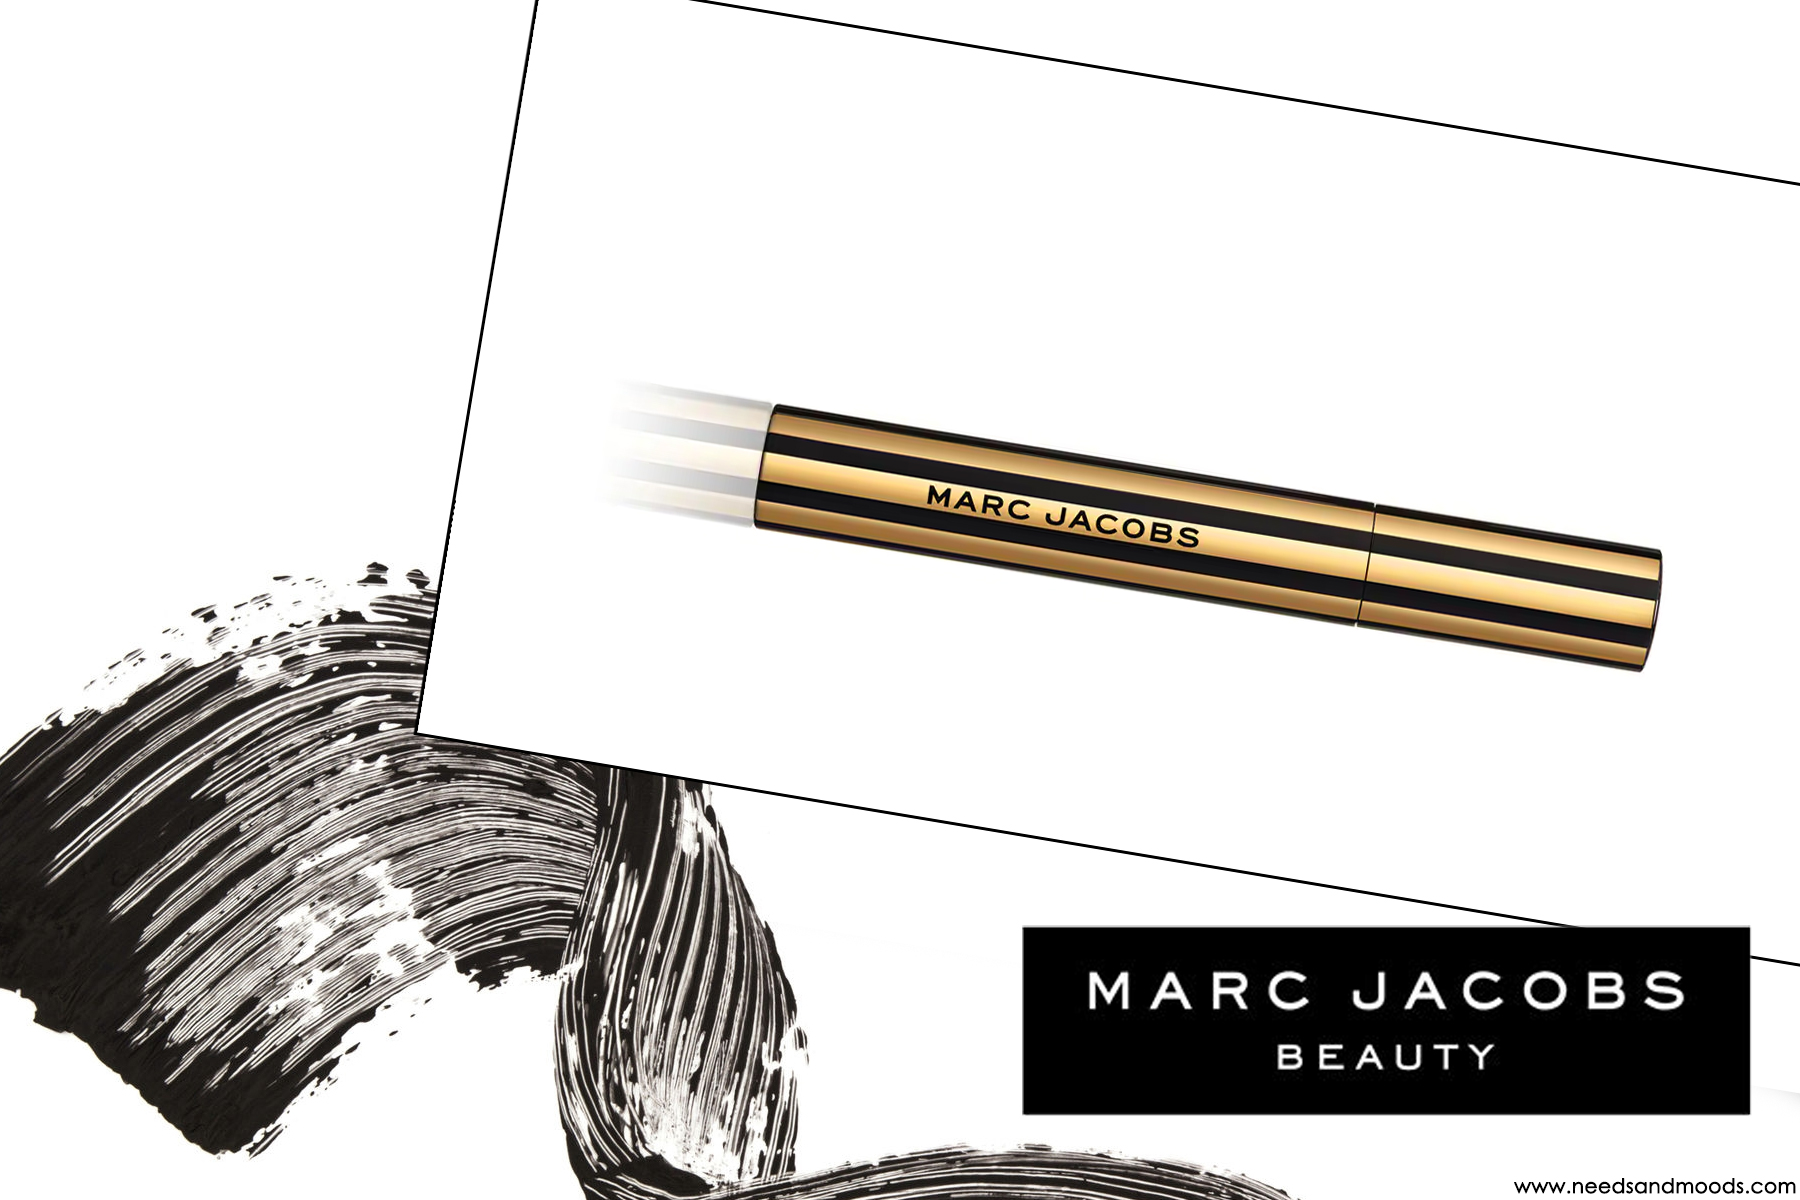 marc jacobs at lash'd mascara